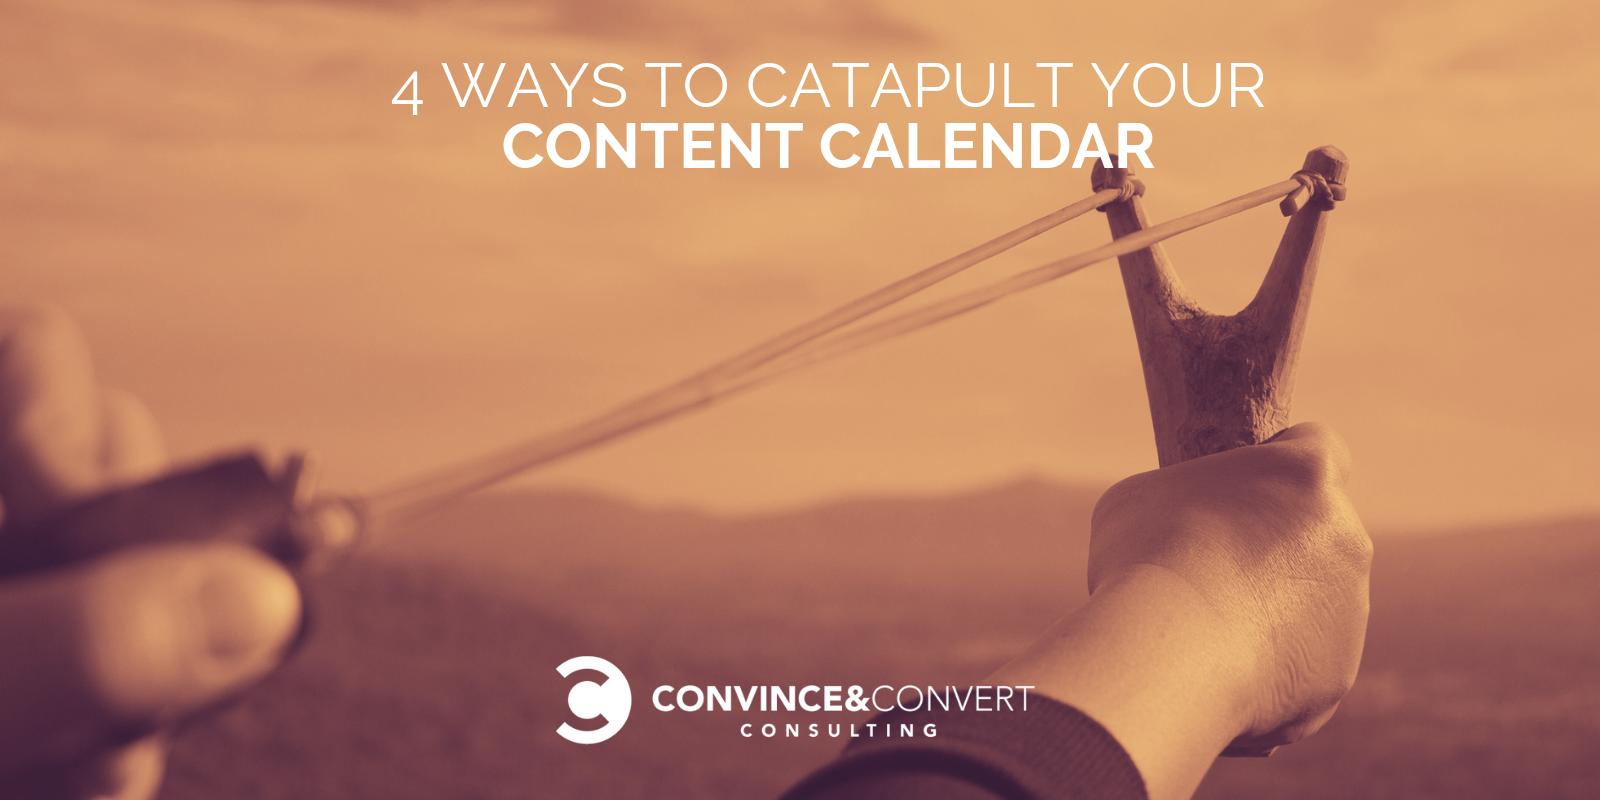 Catapult Your Content Calendar